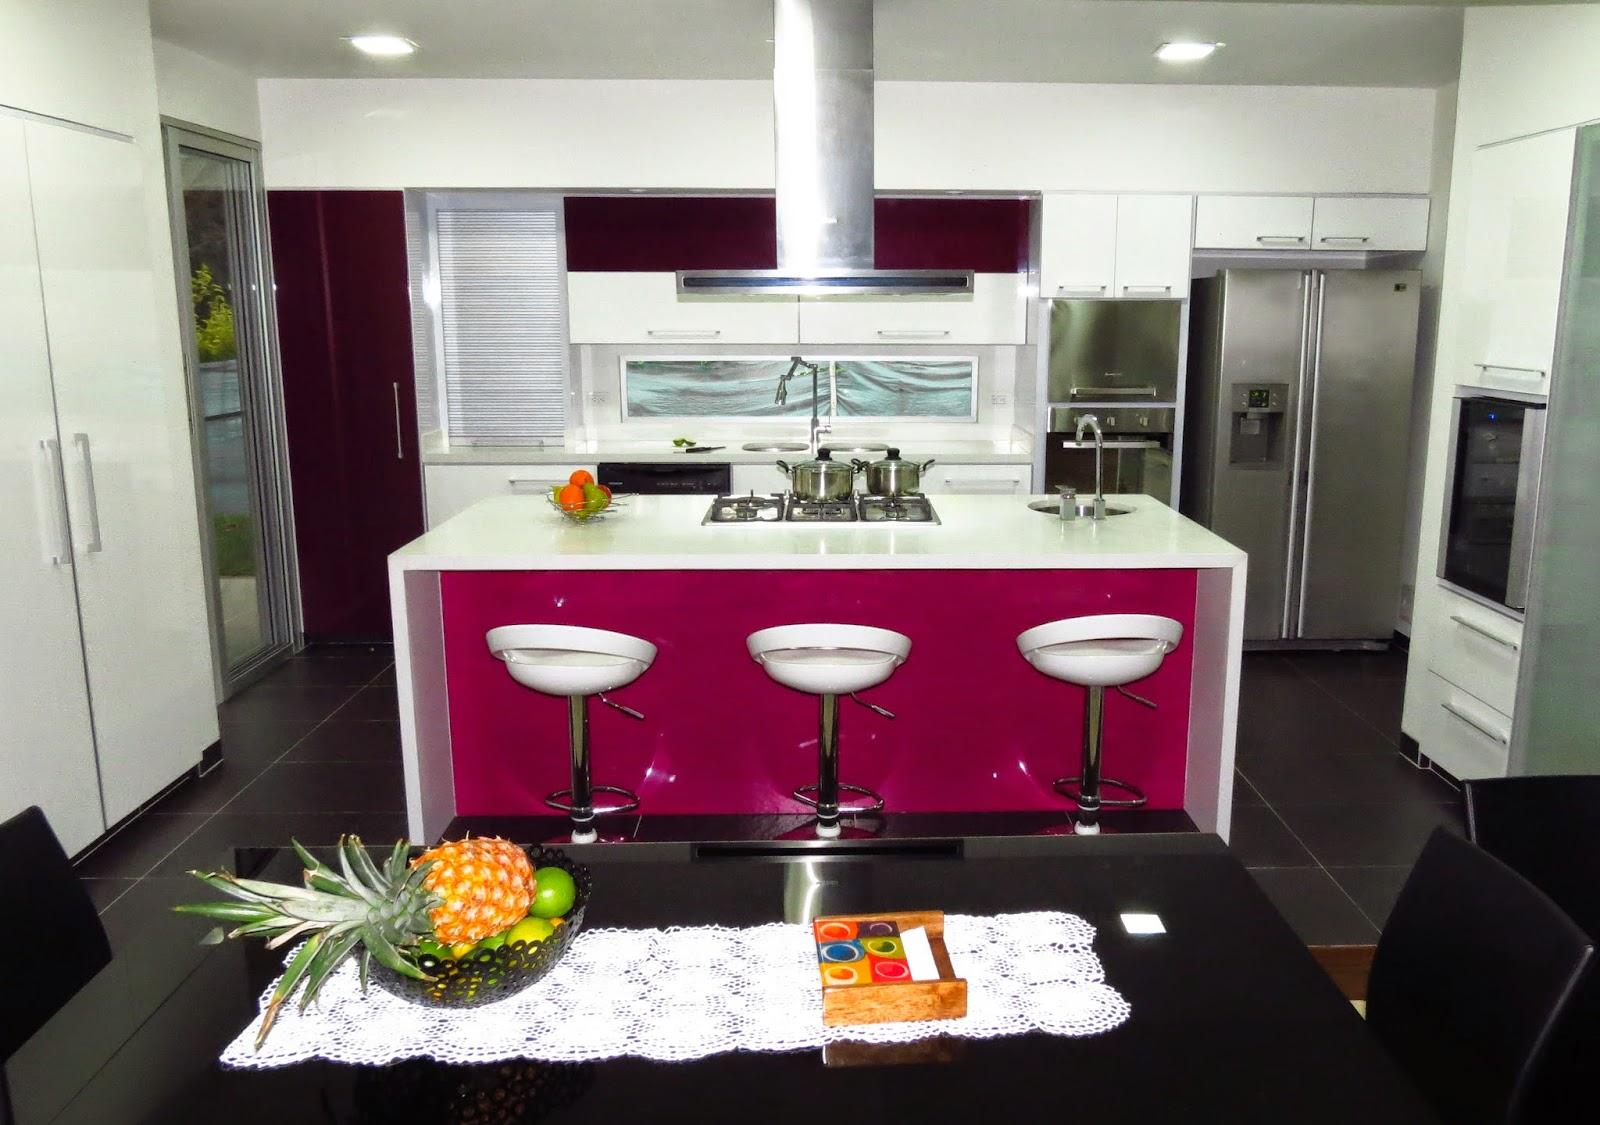 Cocinas De Colores Modernas - Decoración Del Hogar - Prosalo.com